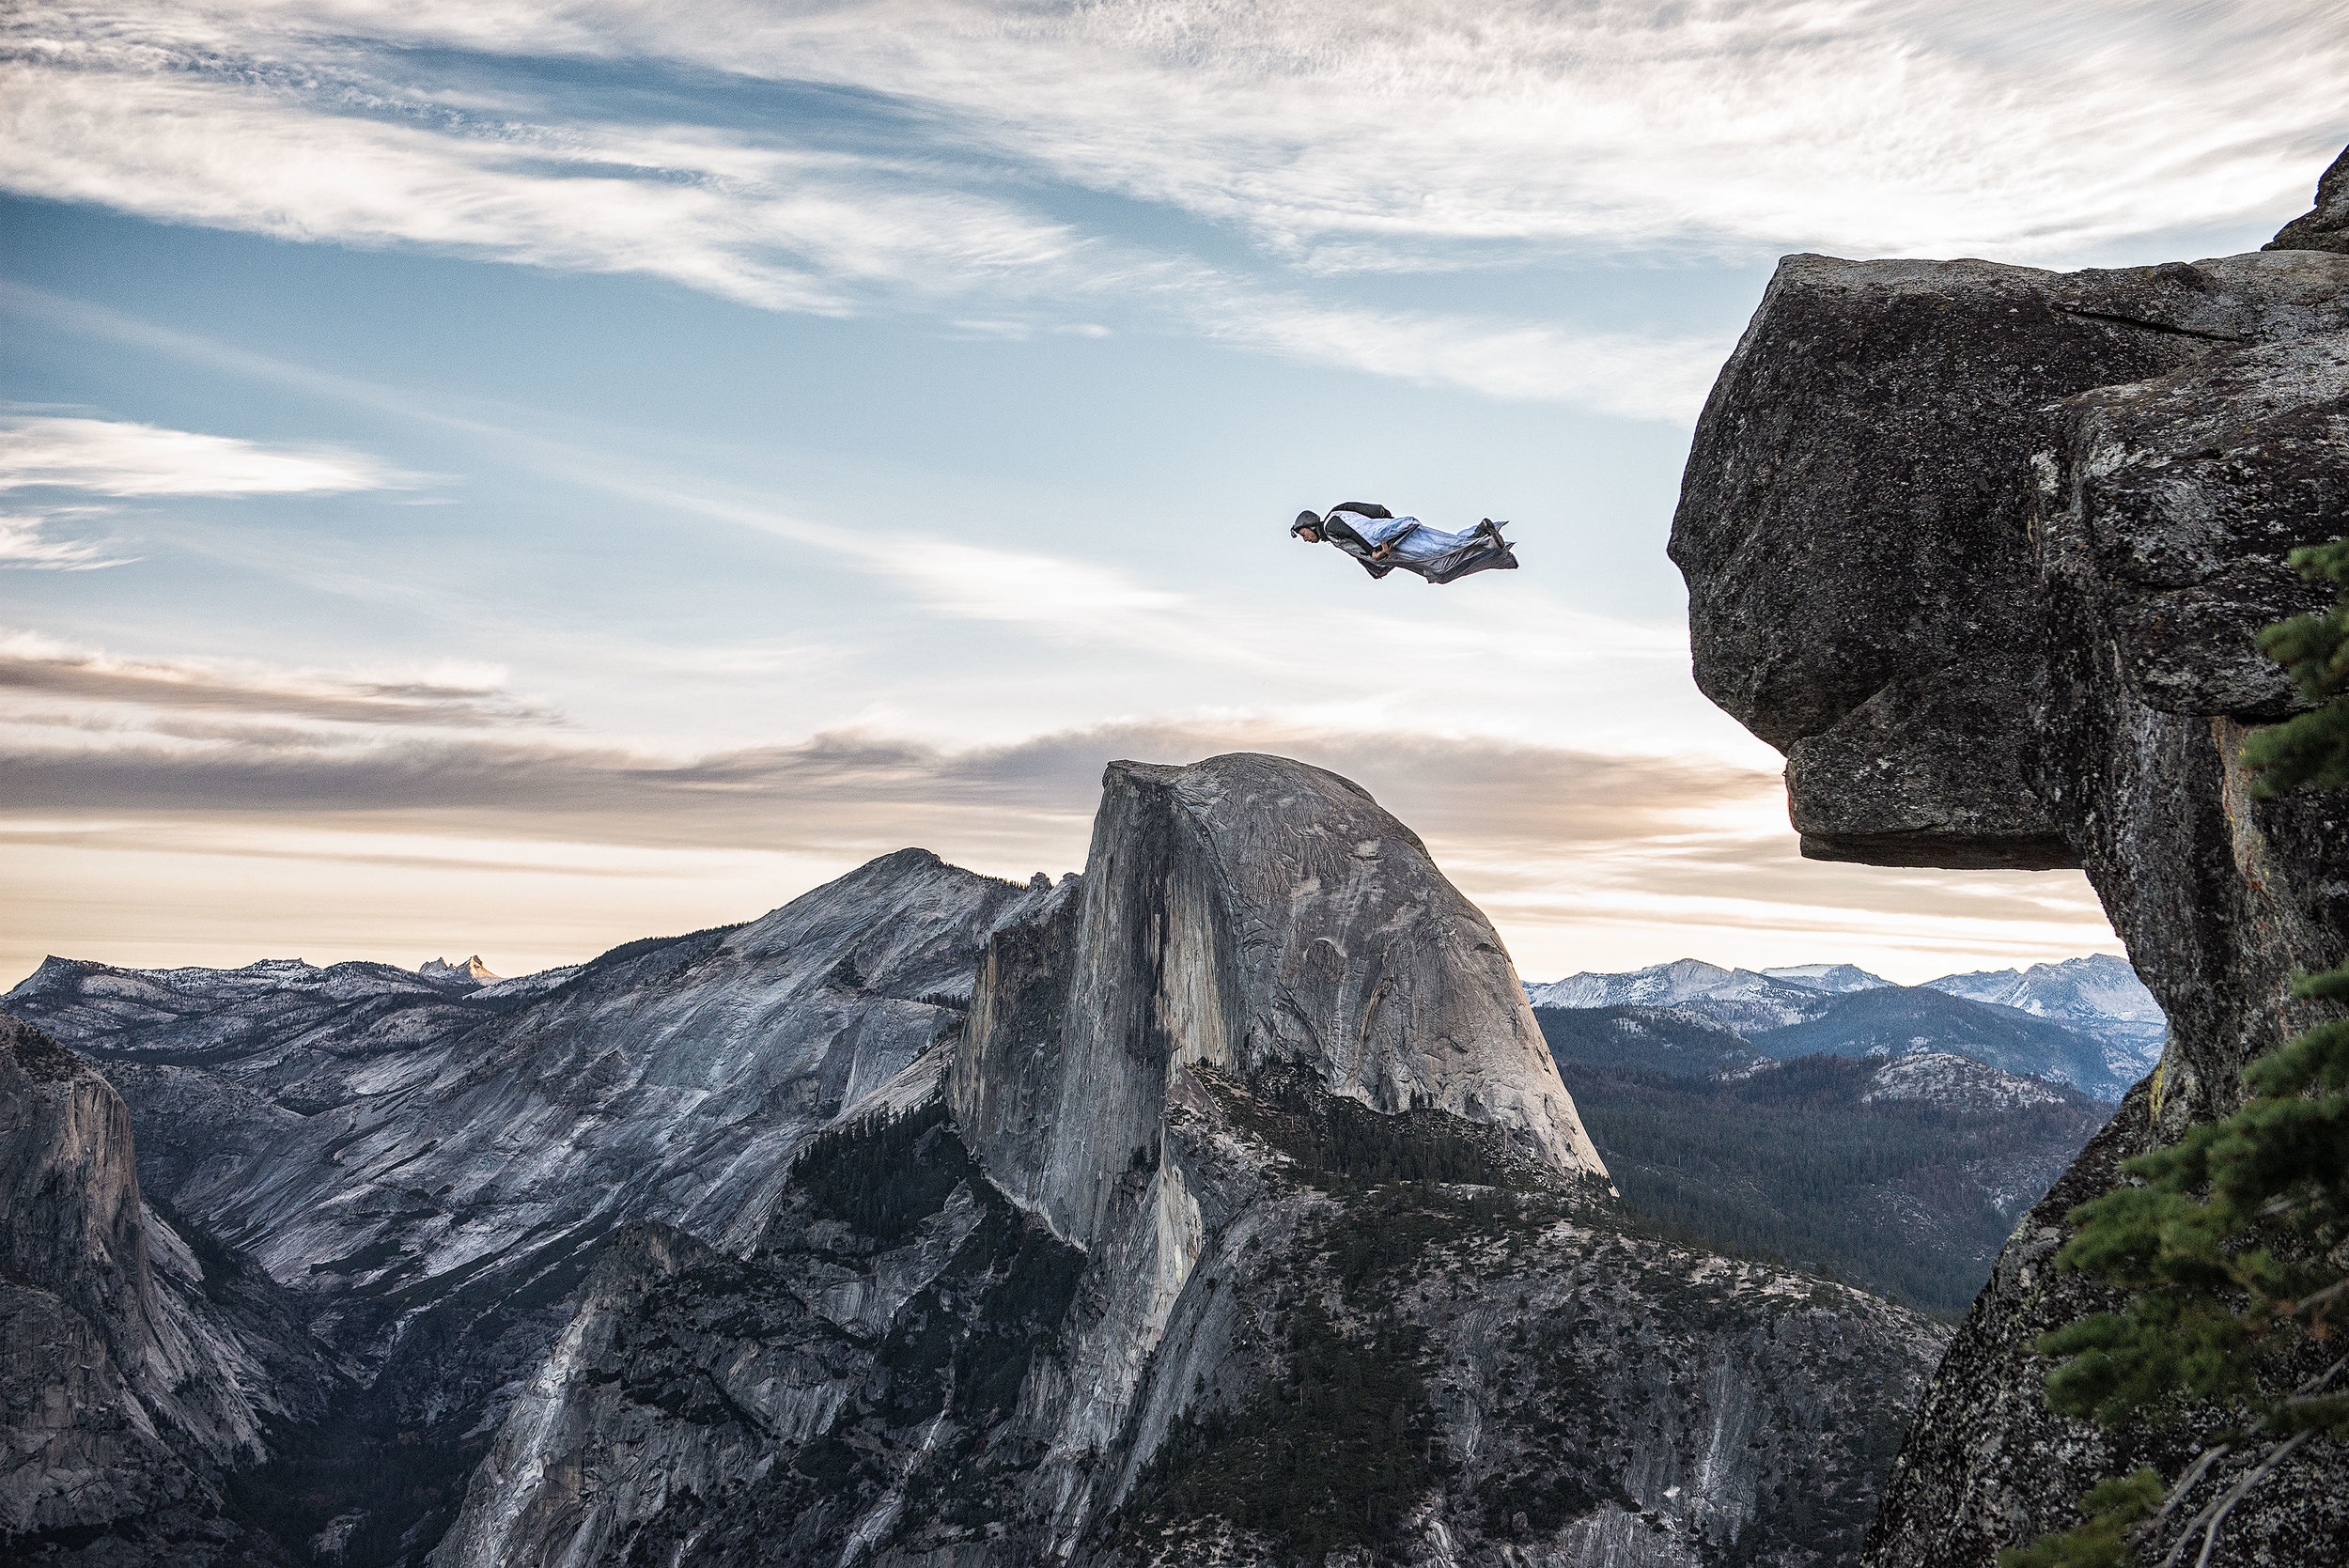 austin-trigg-wing-suit-base-jump-fly-yosemite-lifestyle-california-adventure-thrill-seeking-glacier-point-sunrise-valley.jpg